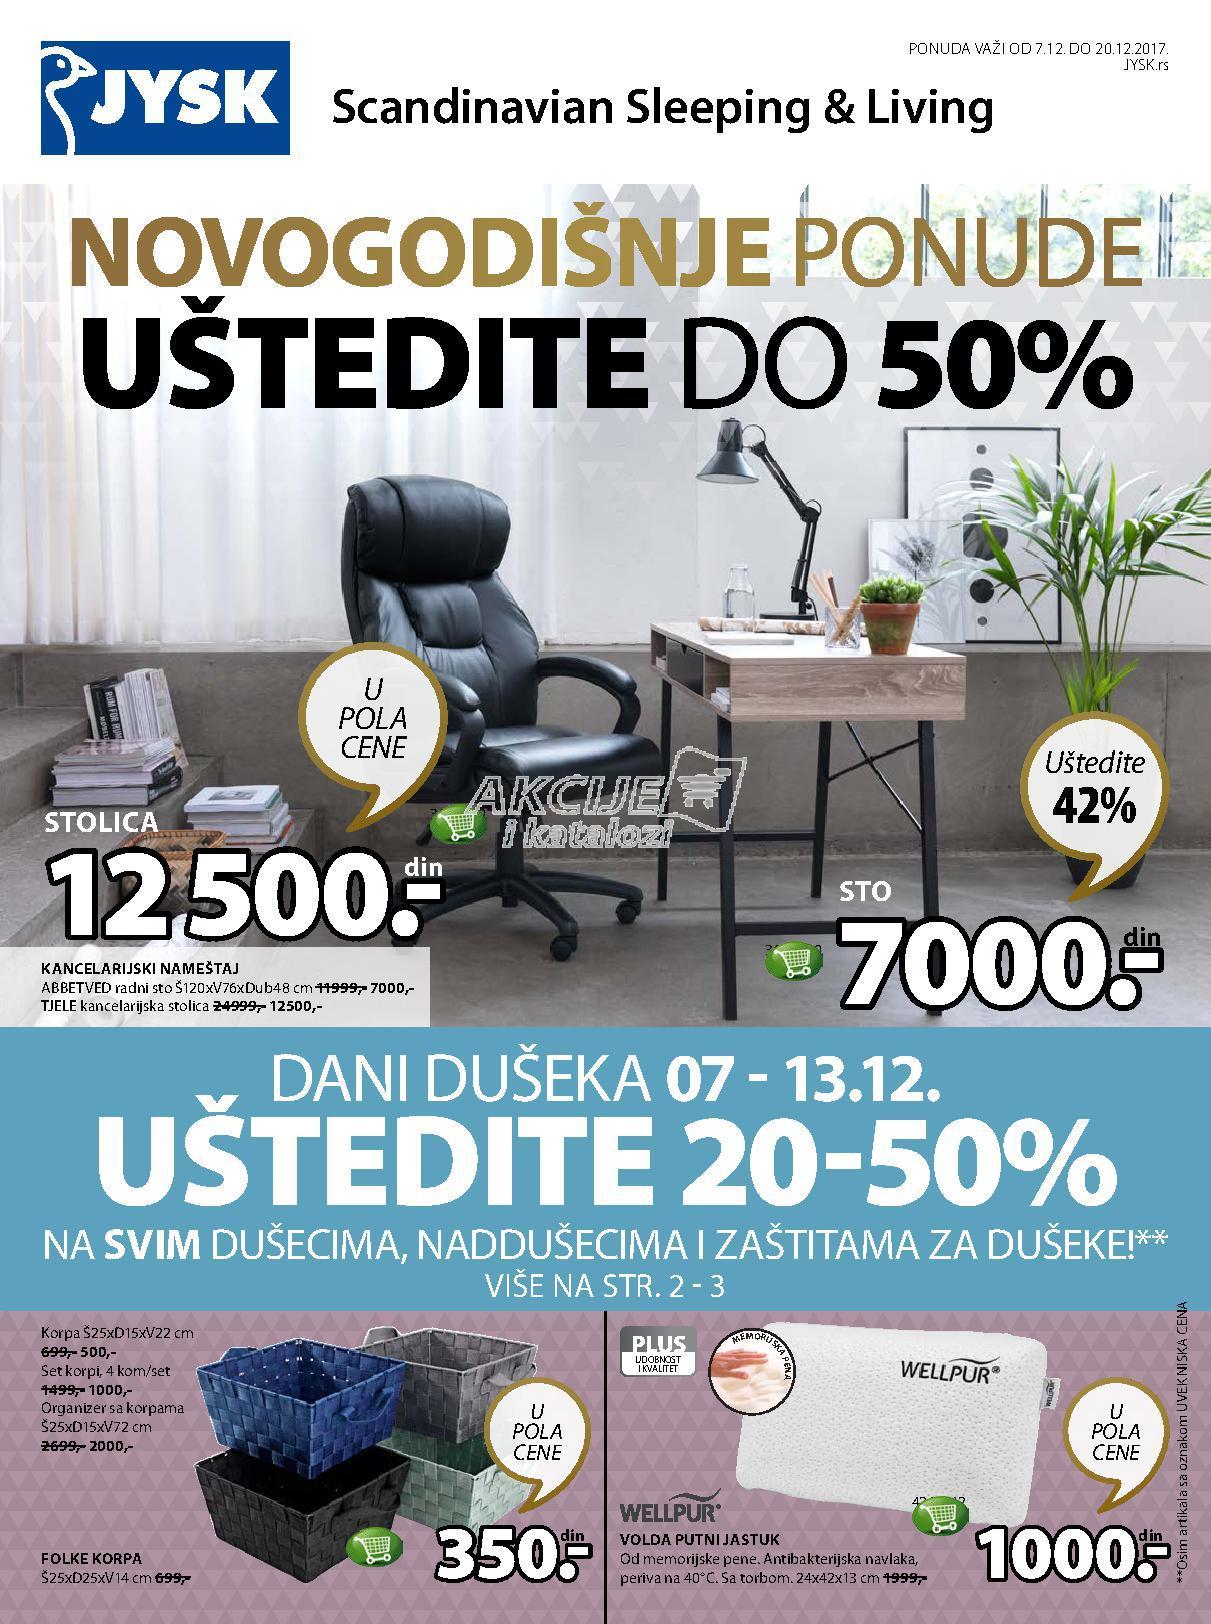 JYSK - Redovna akcija praznične kupovine